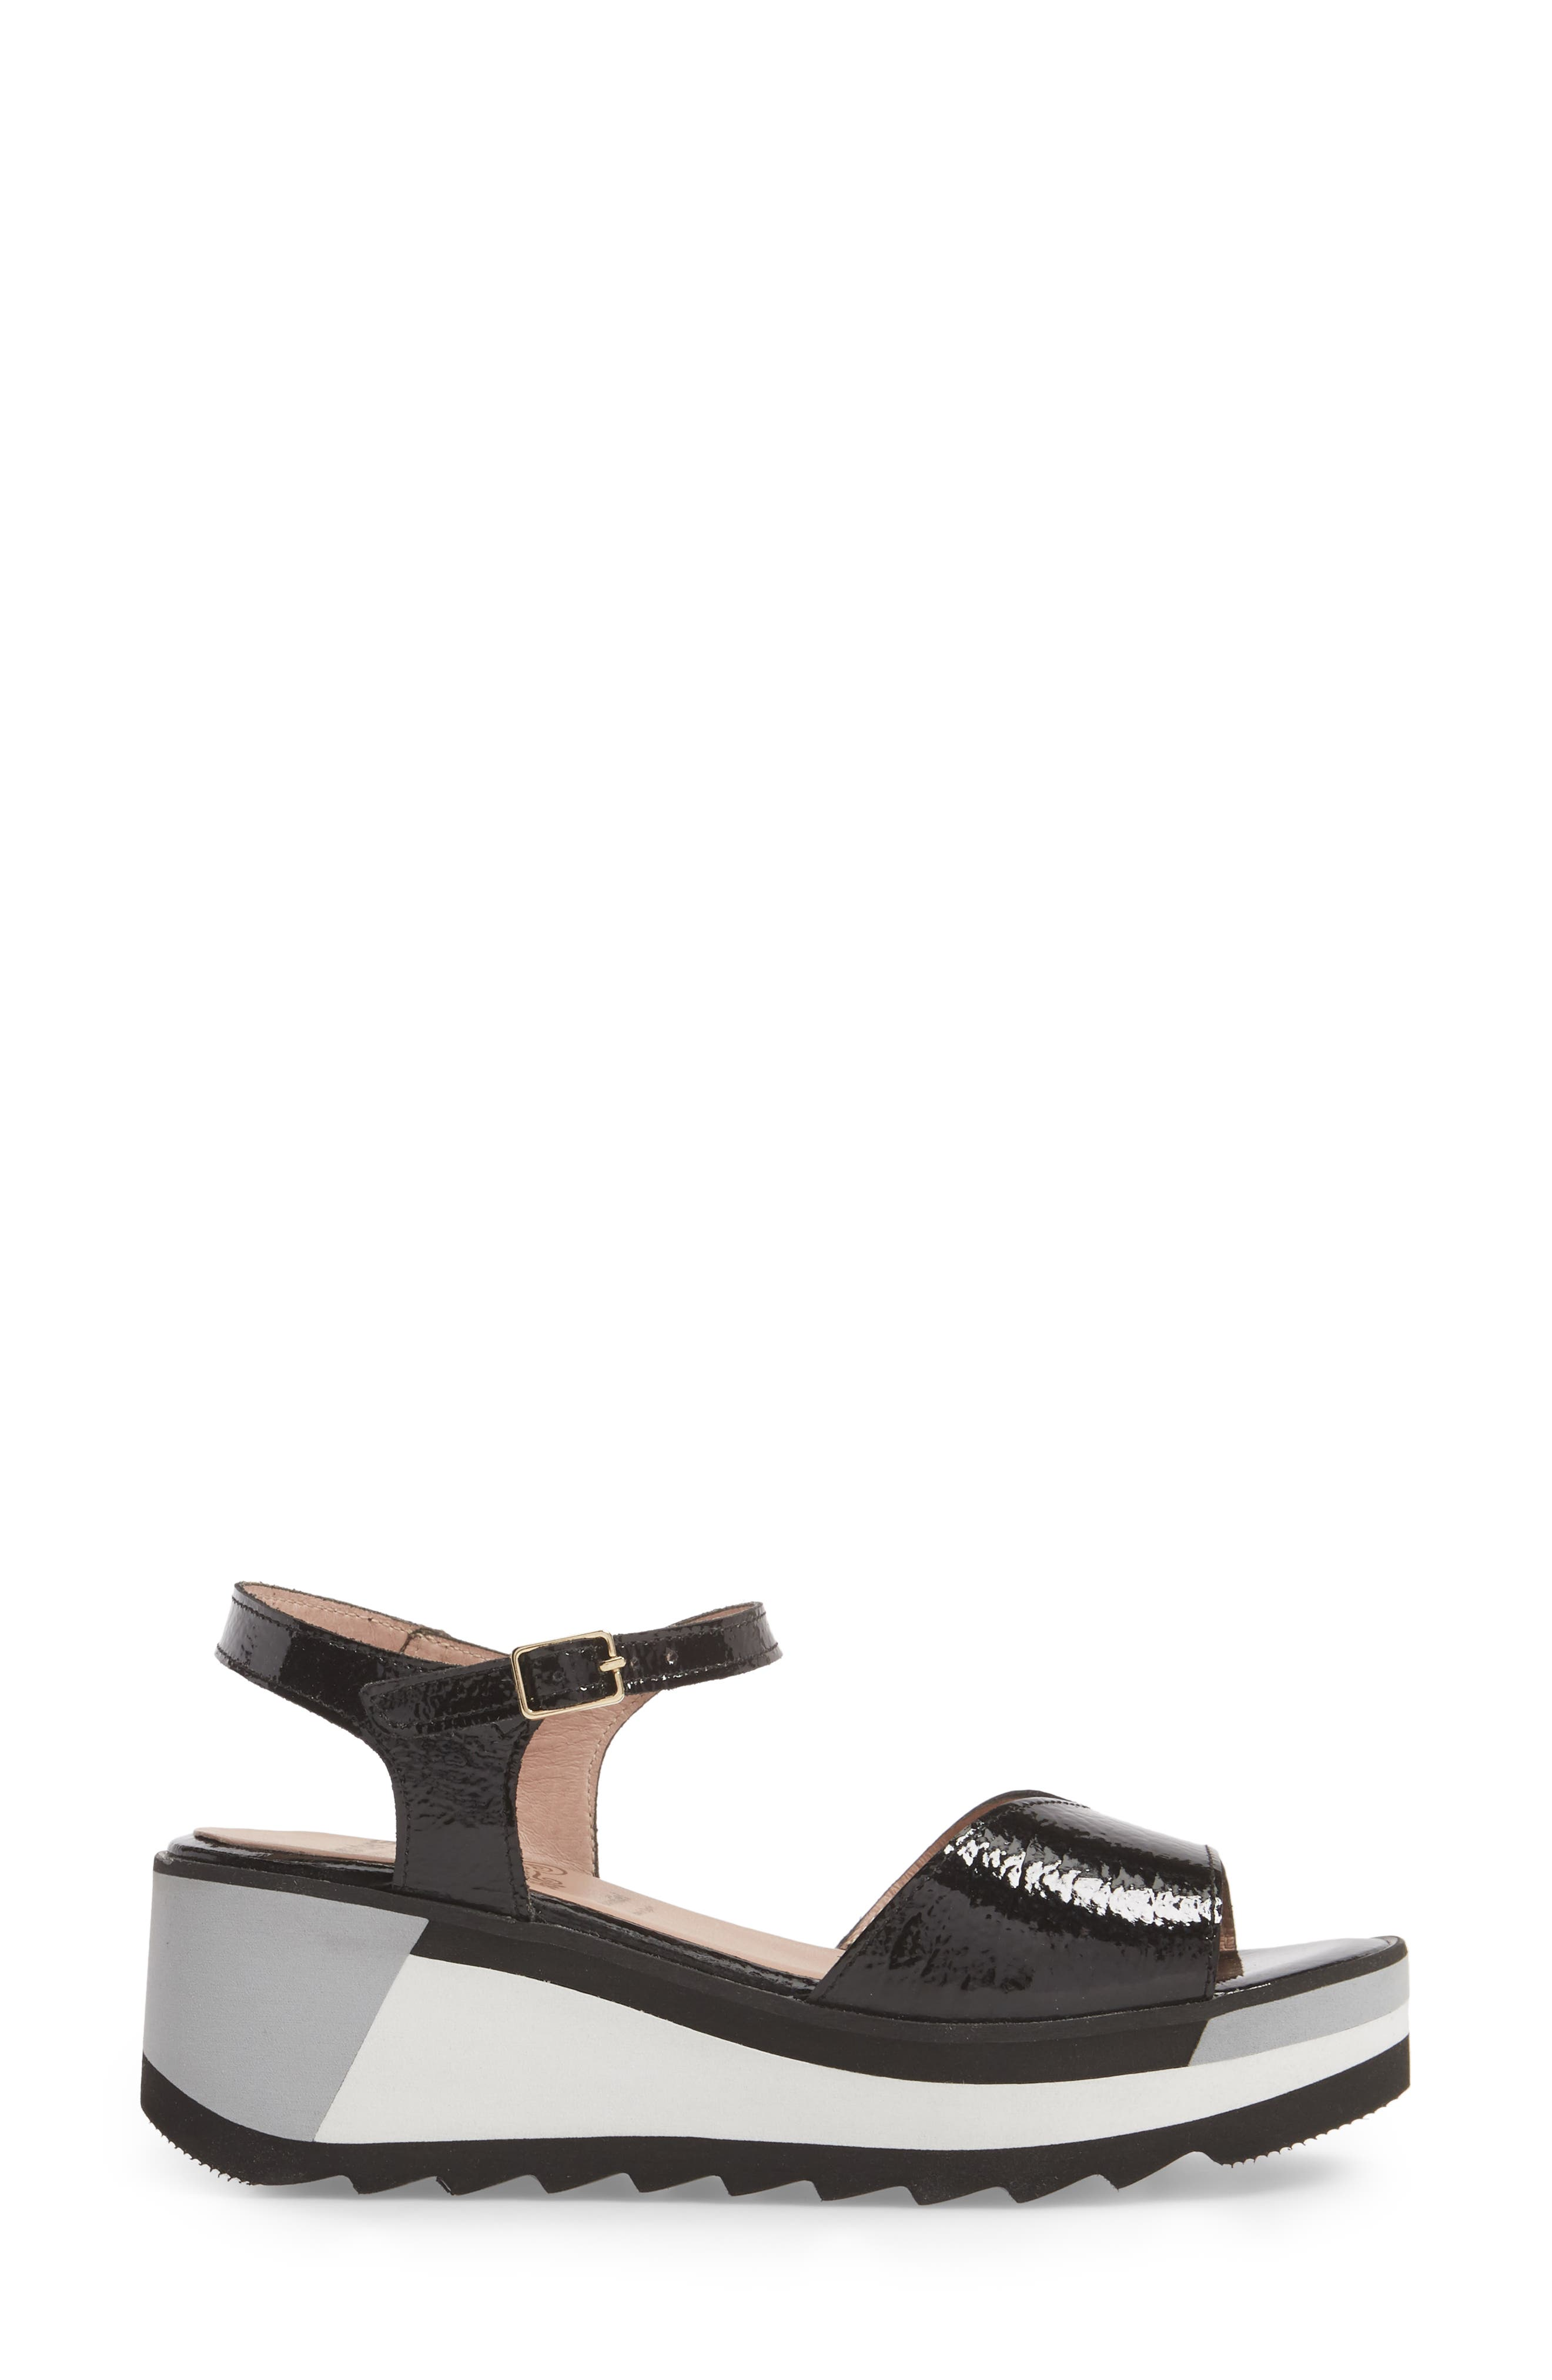 D-7810 Sandal,                             Alternate thumbnail 3, color,                             Black Patent Leather